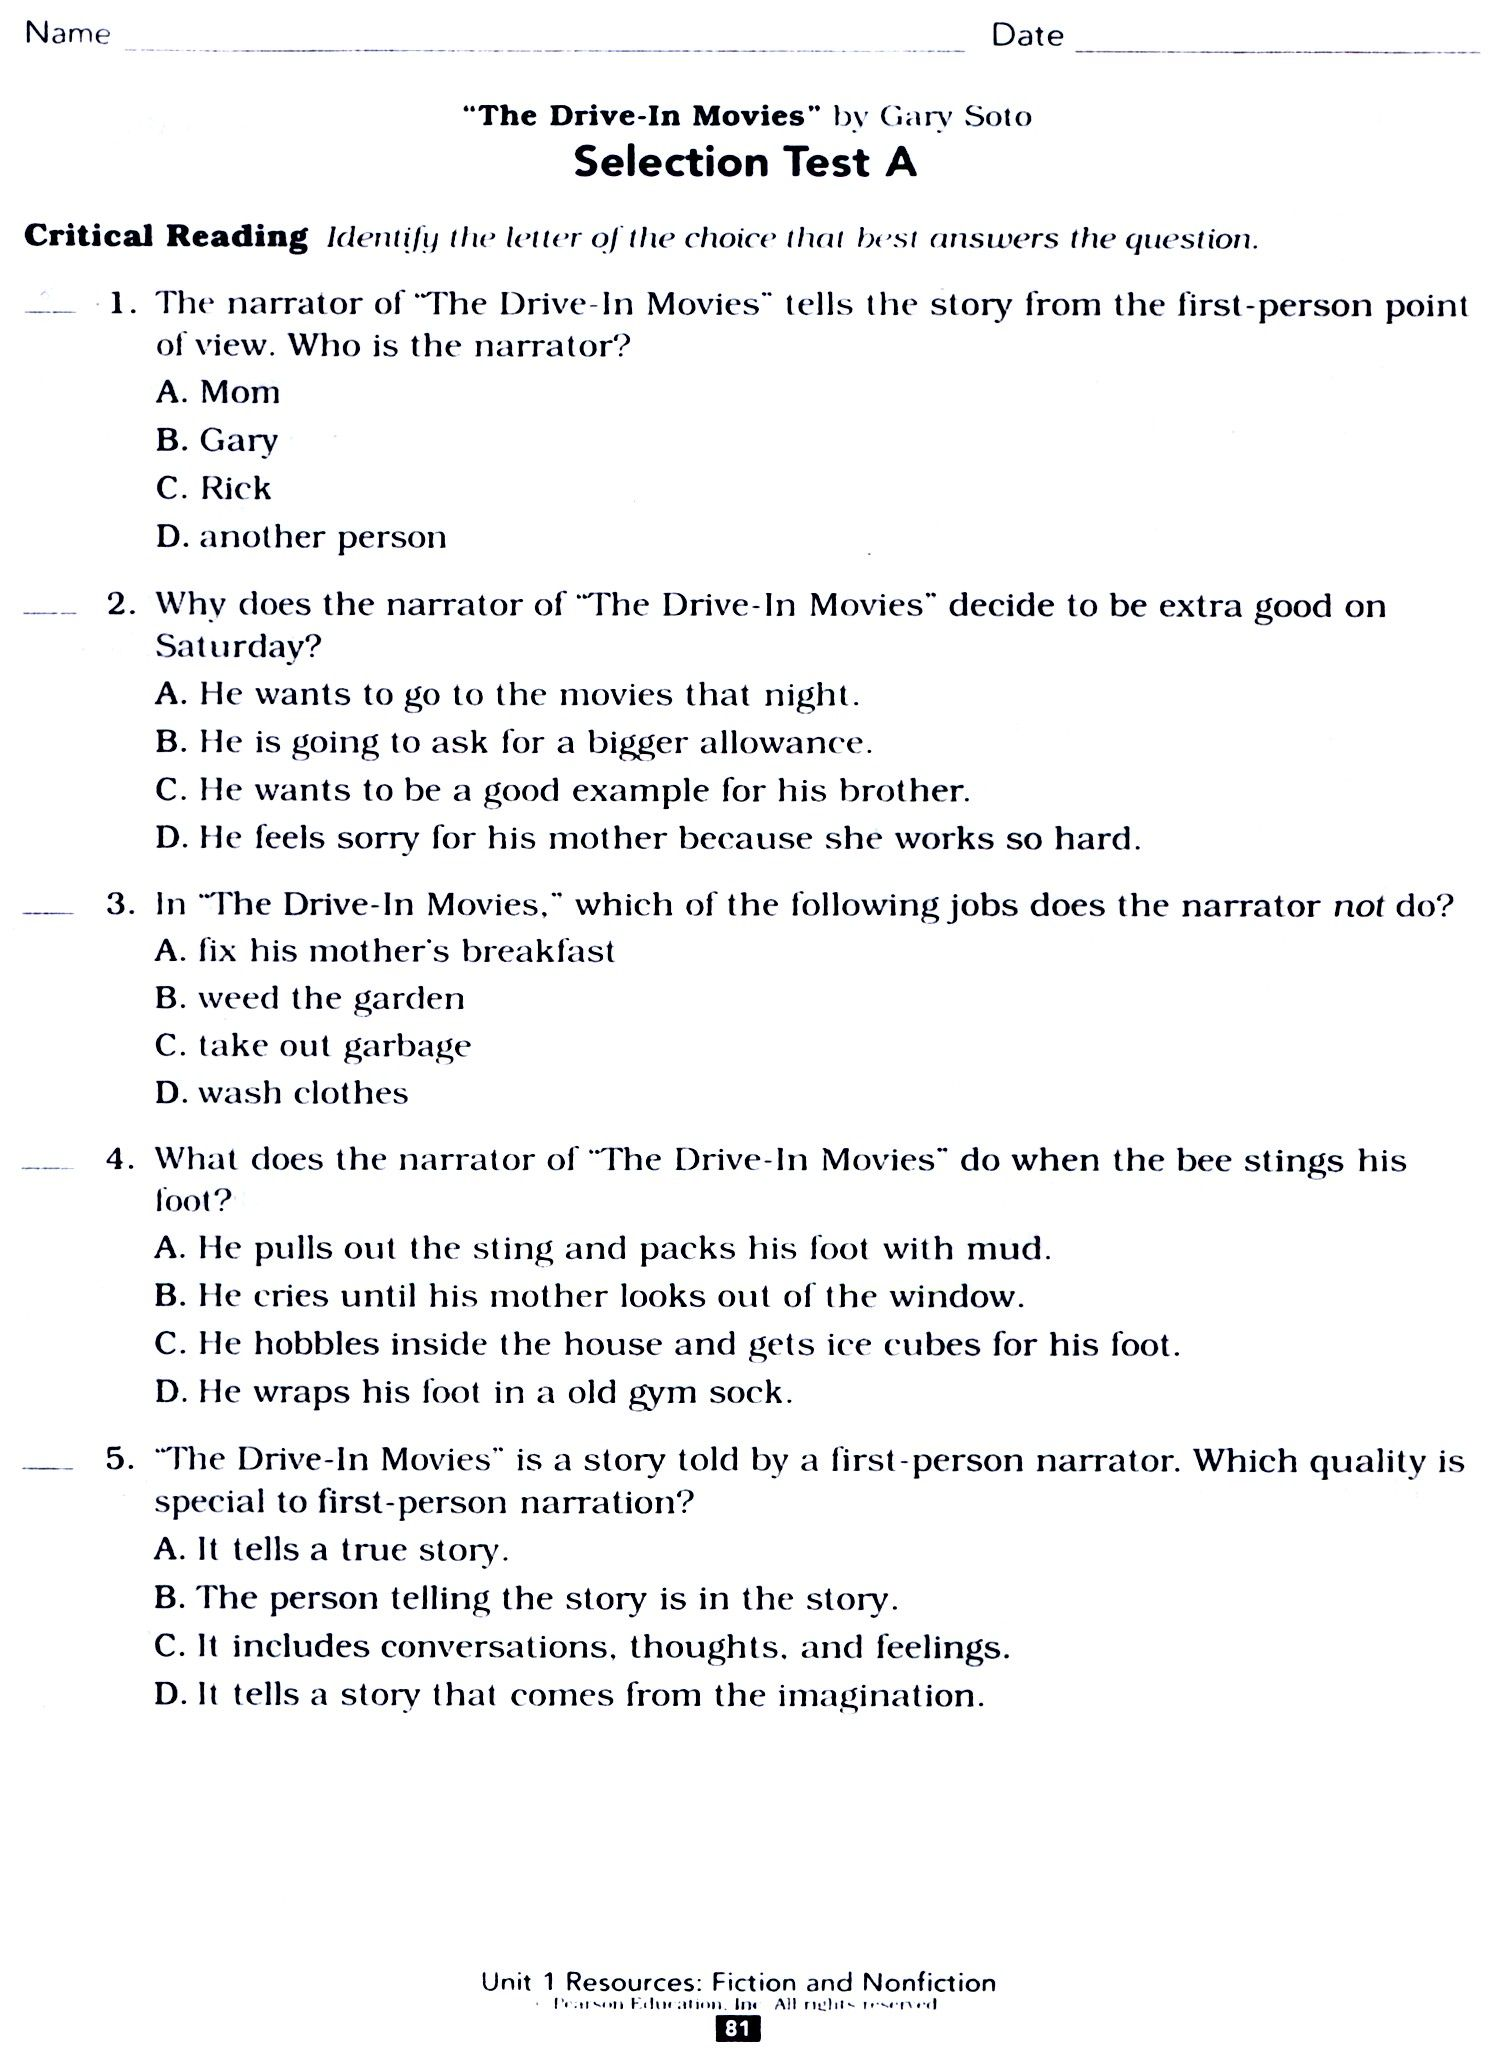 7th Grade Social Studies Worksheets With Answers Social Studies Worksheets Free Printab Social Studies Worksheets 7th Grade Social Studies 6th Grade Worksheets